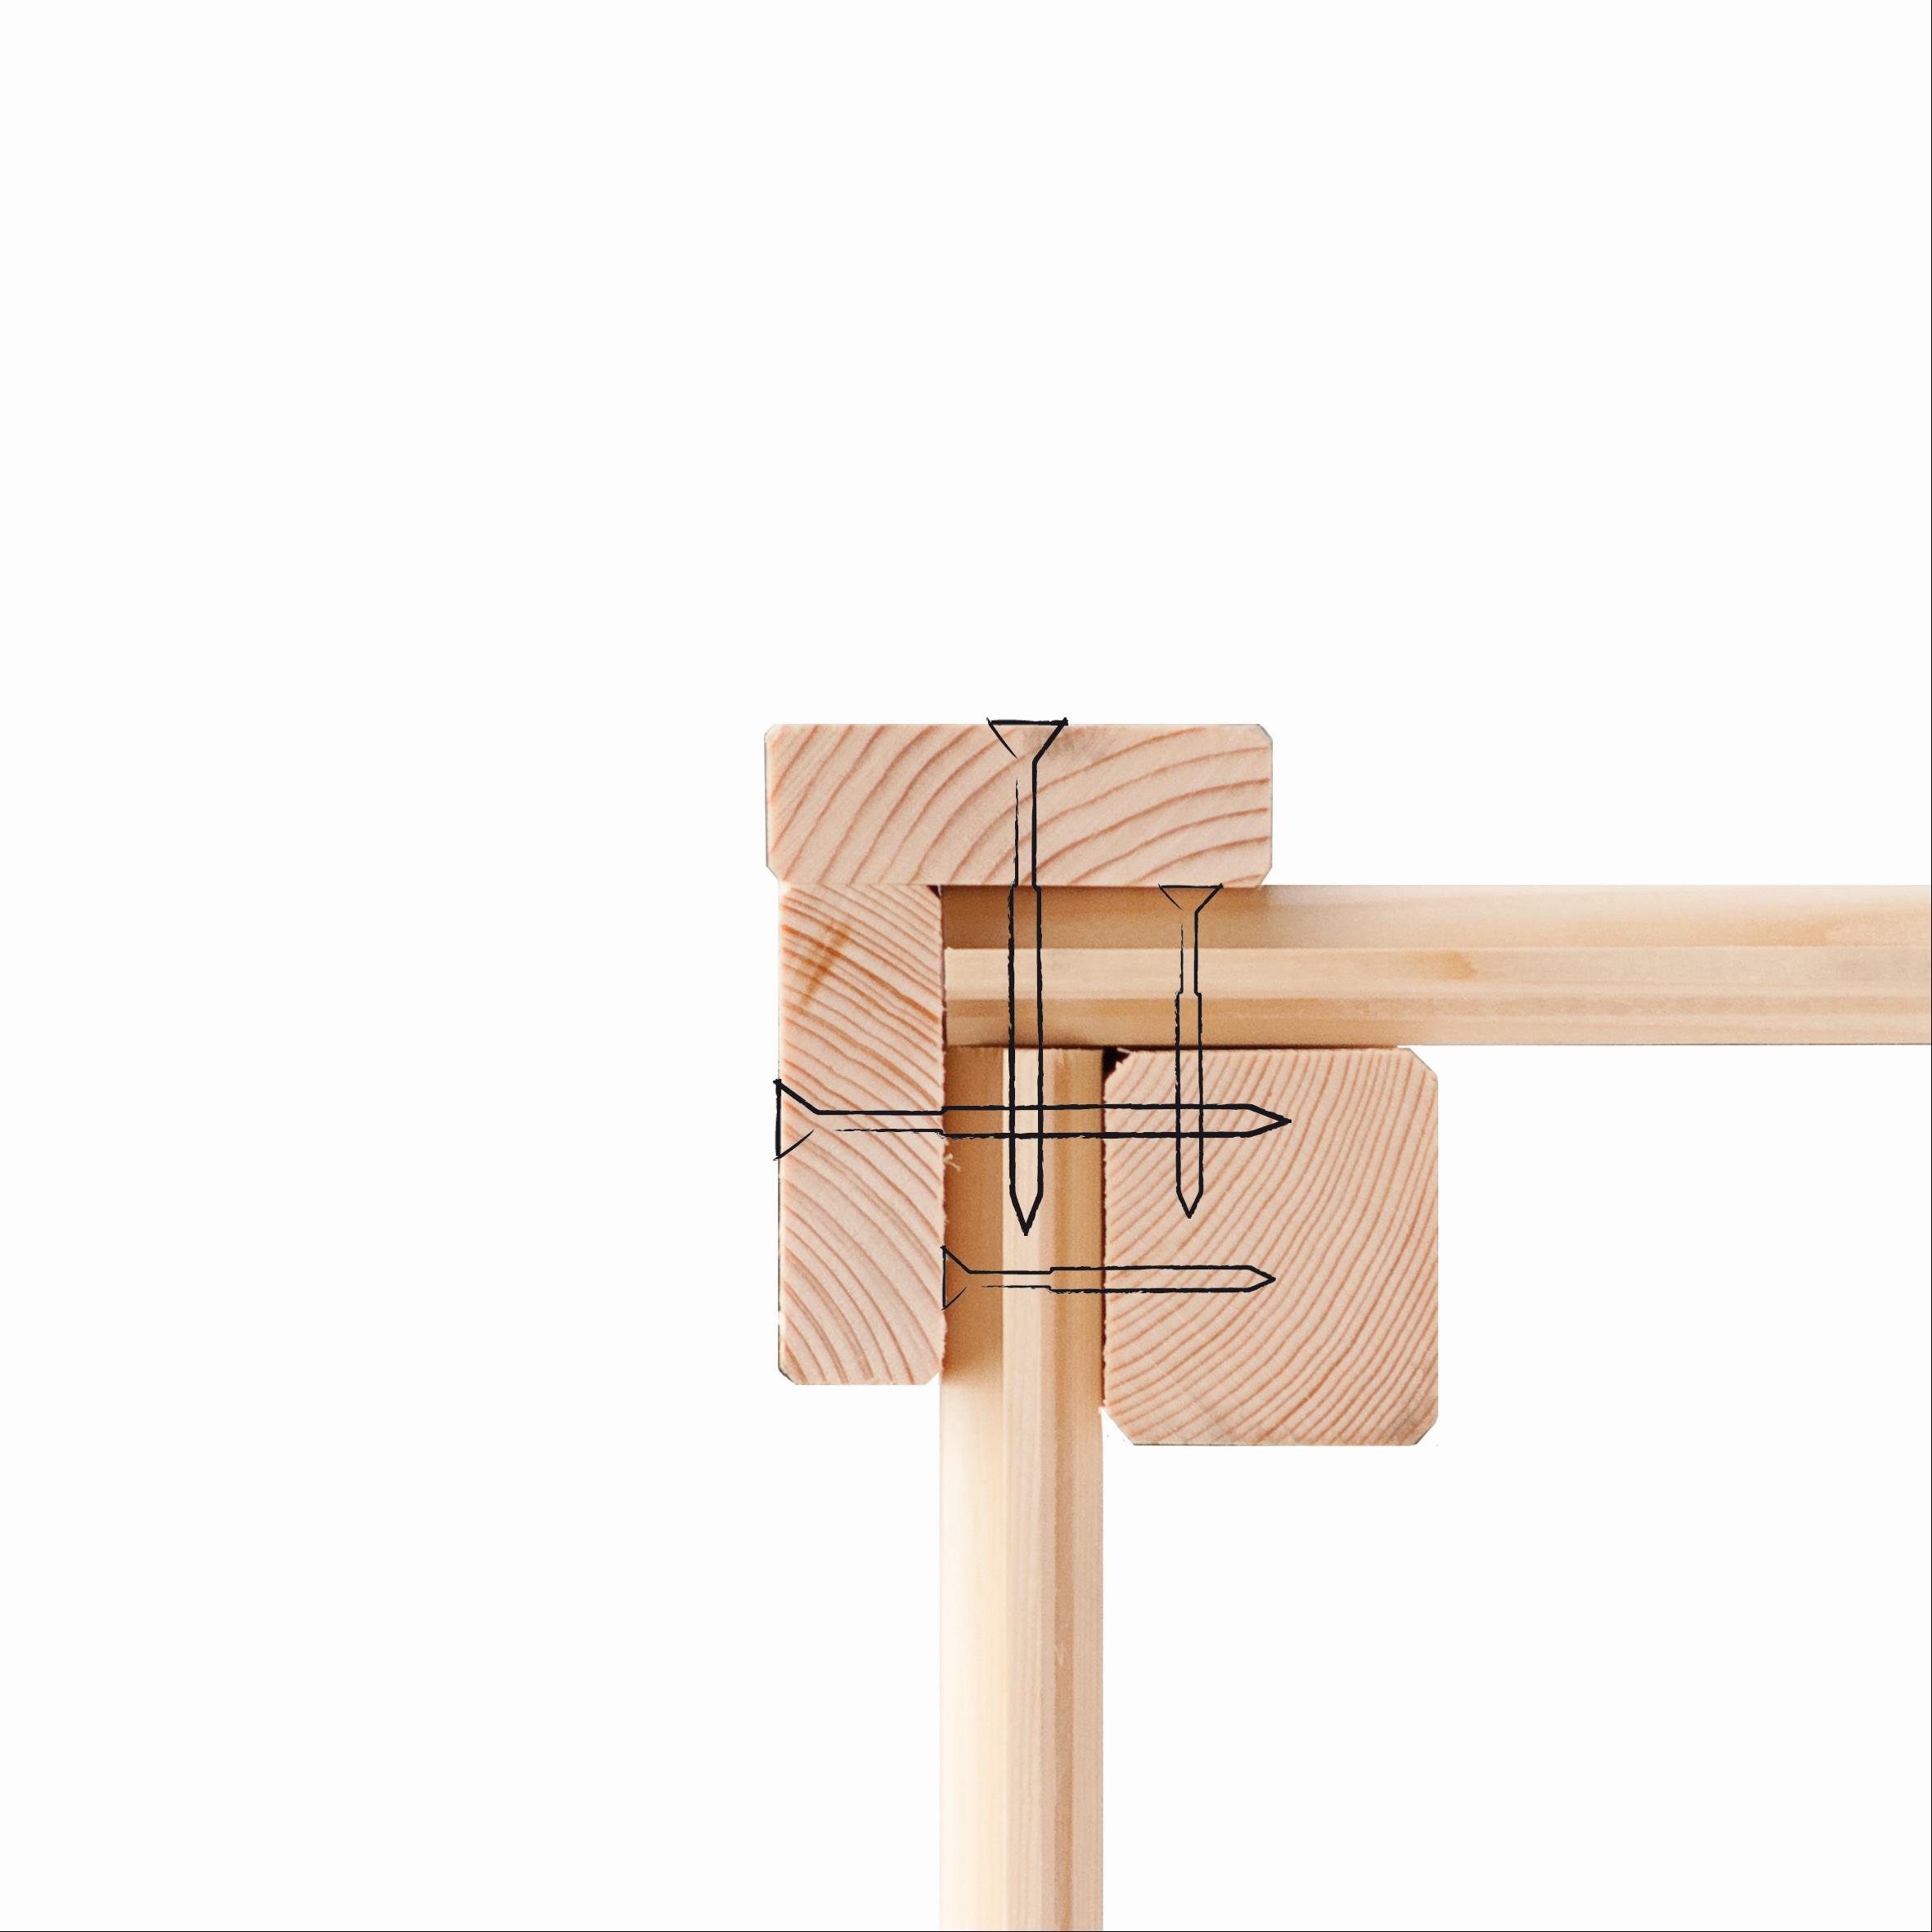 Woodfeeling Mähroboter Haus / Garage 1 seidengrau 73x77x49cm Bild 6